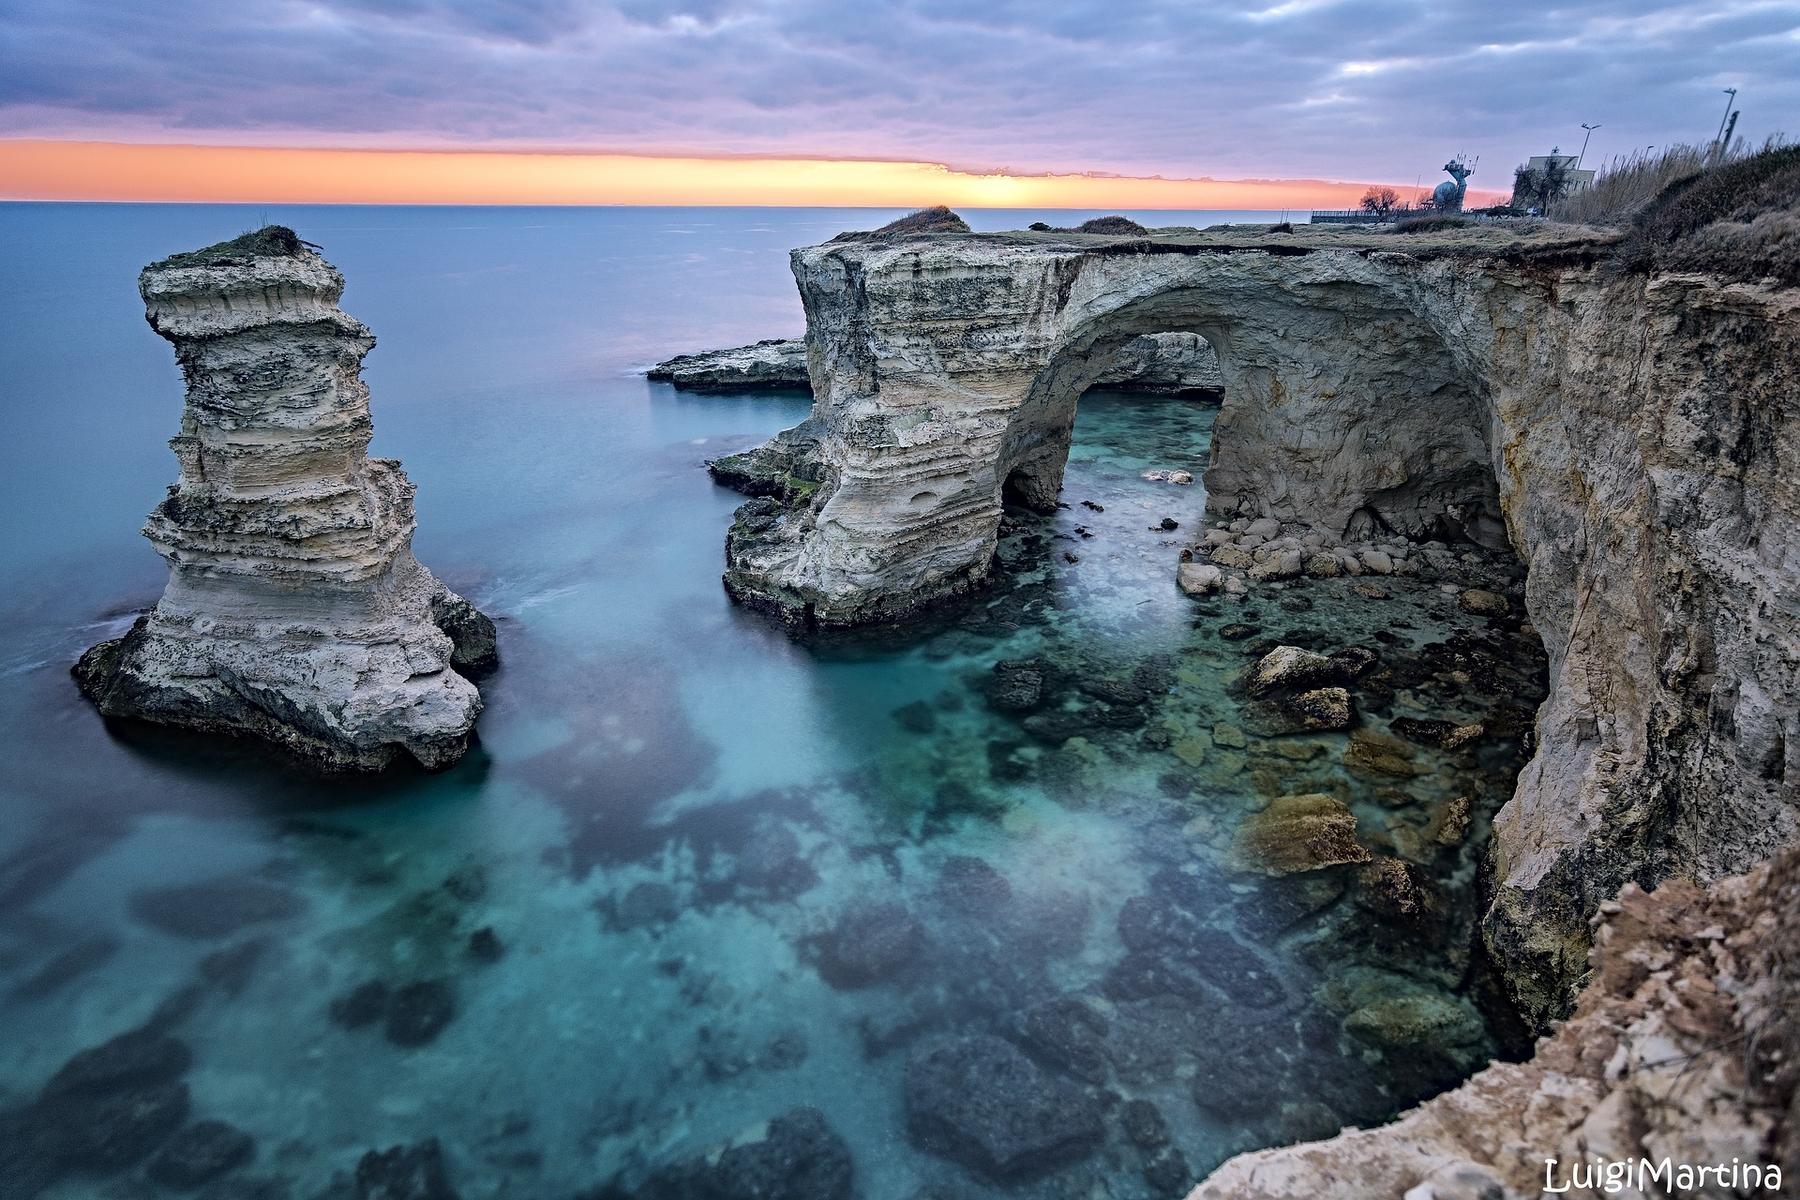 Que ver cerca de Otranto: Meledugno